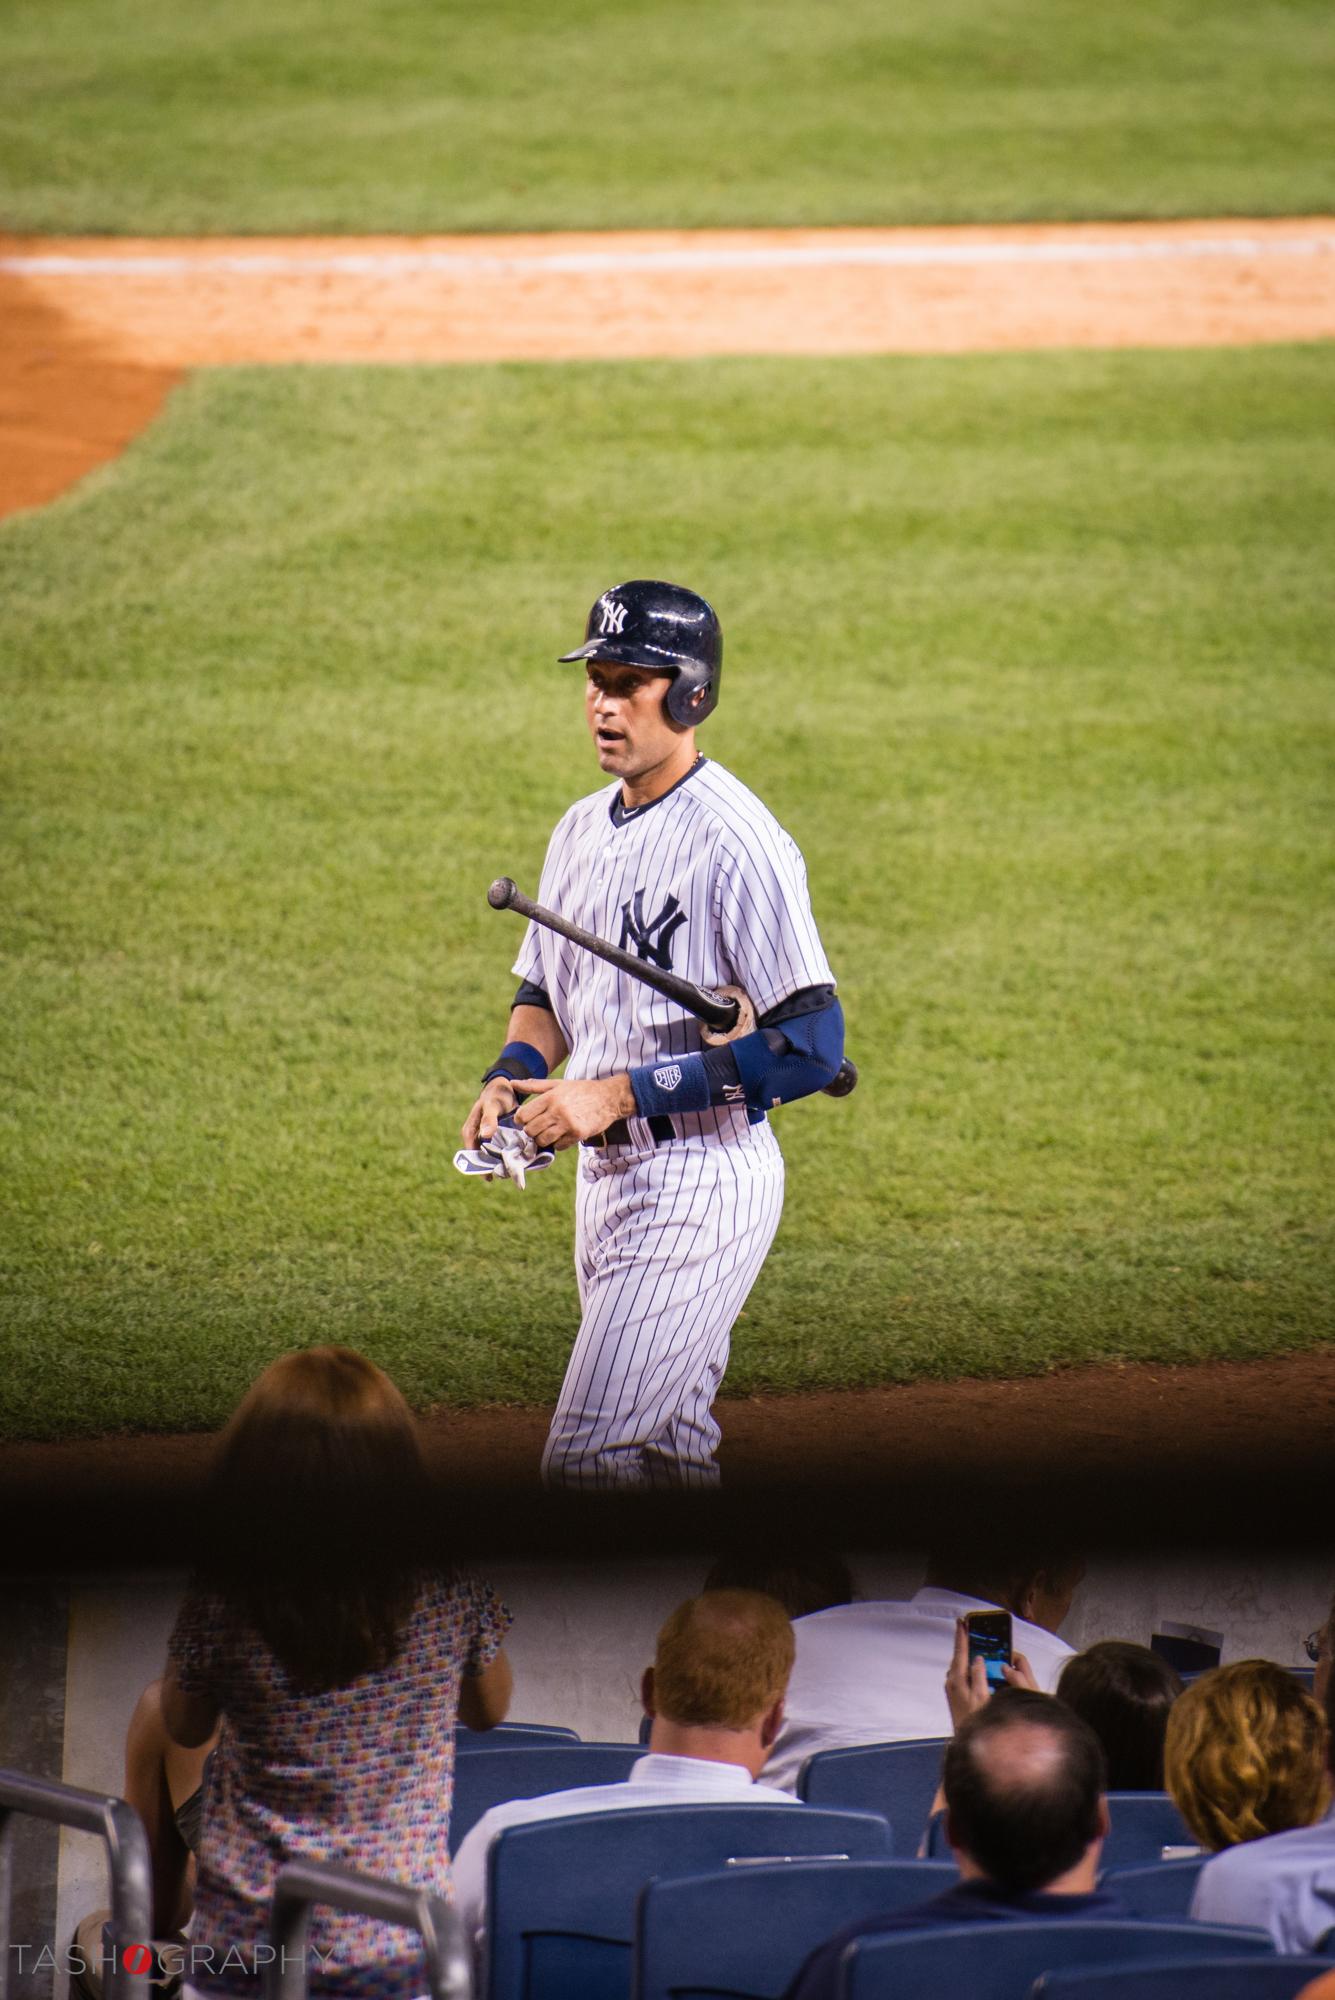 Yankees-090314-44.jpg